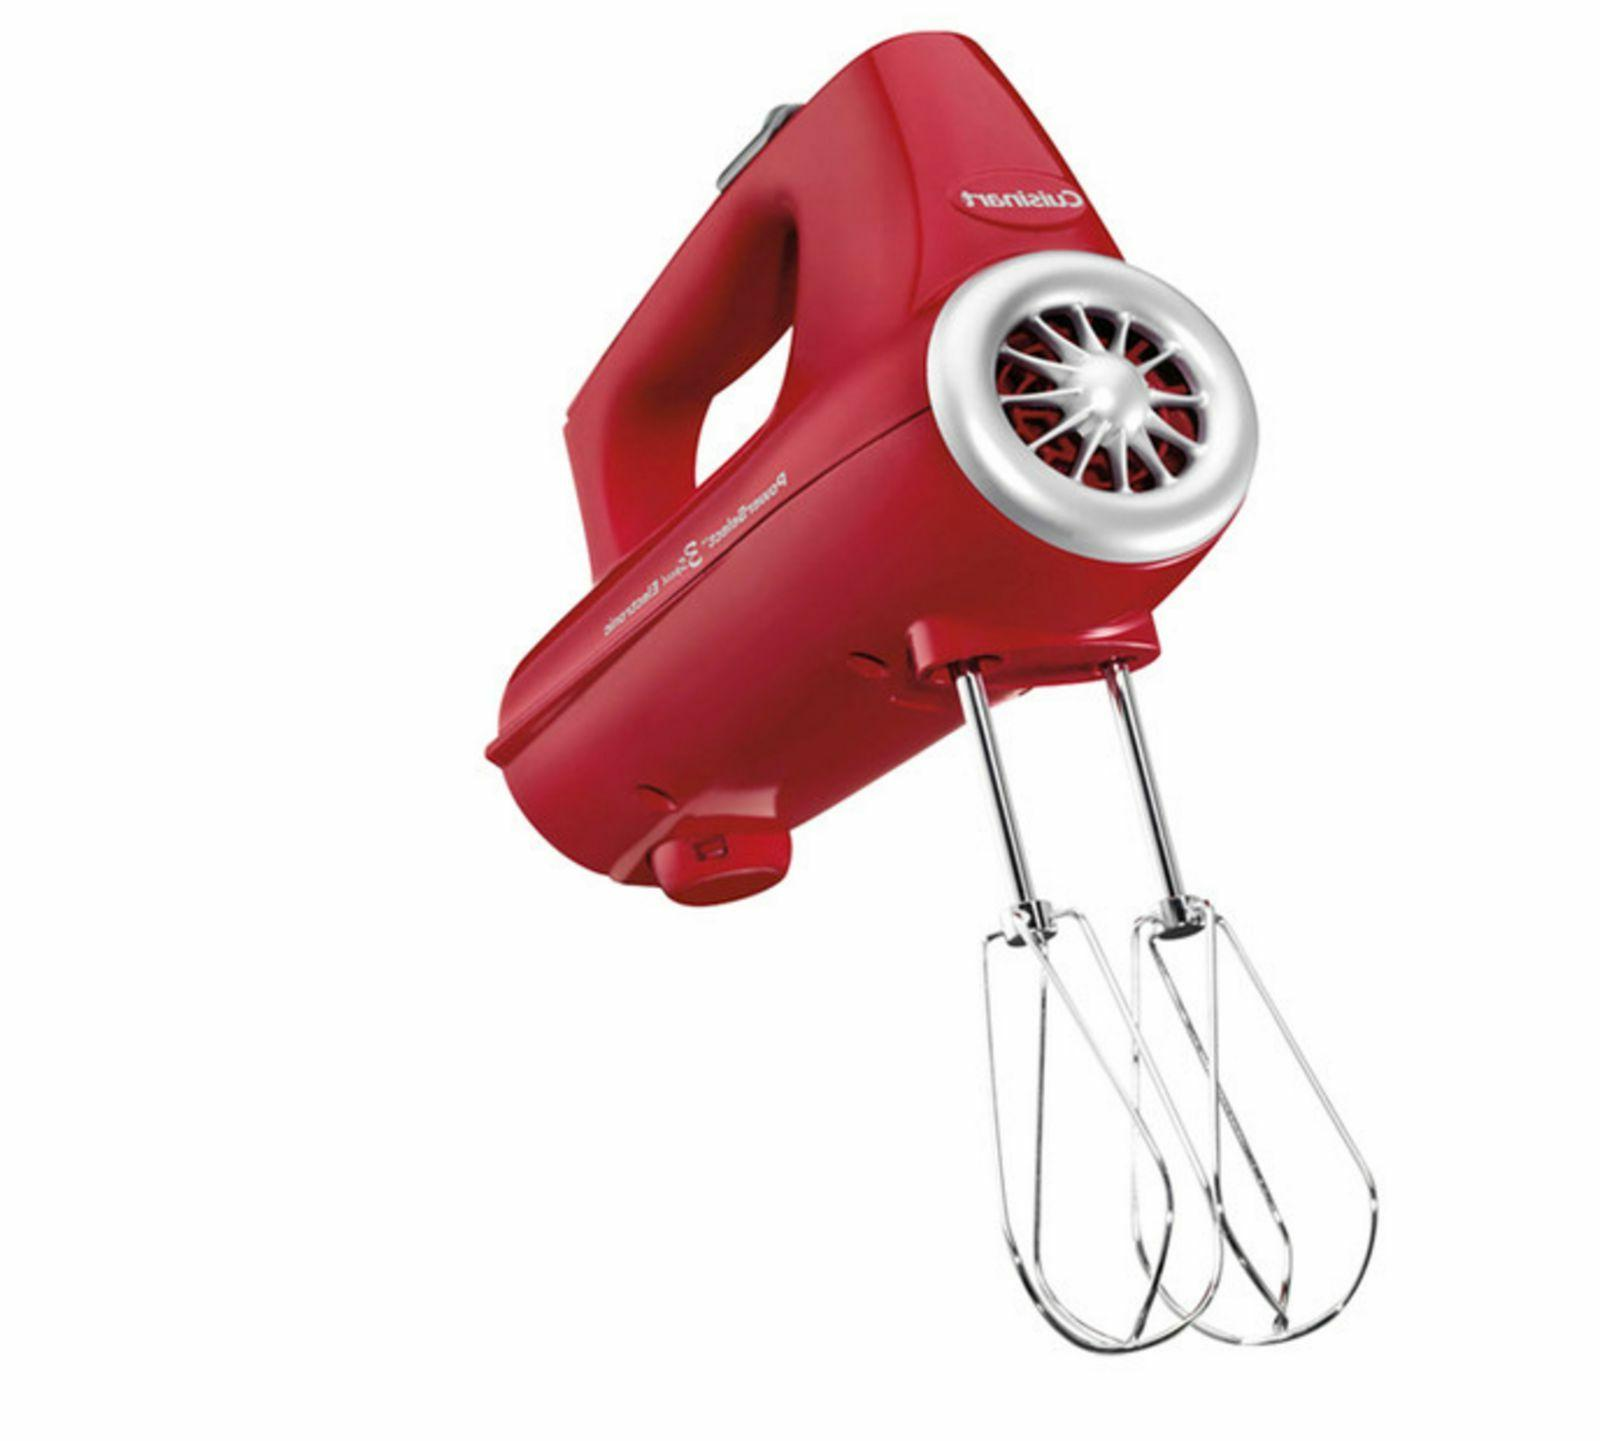 Cuisinart - Hand Mixer -